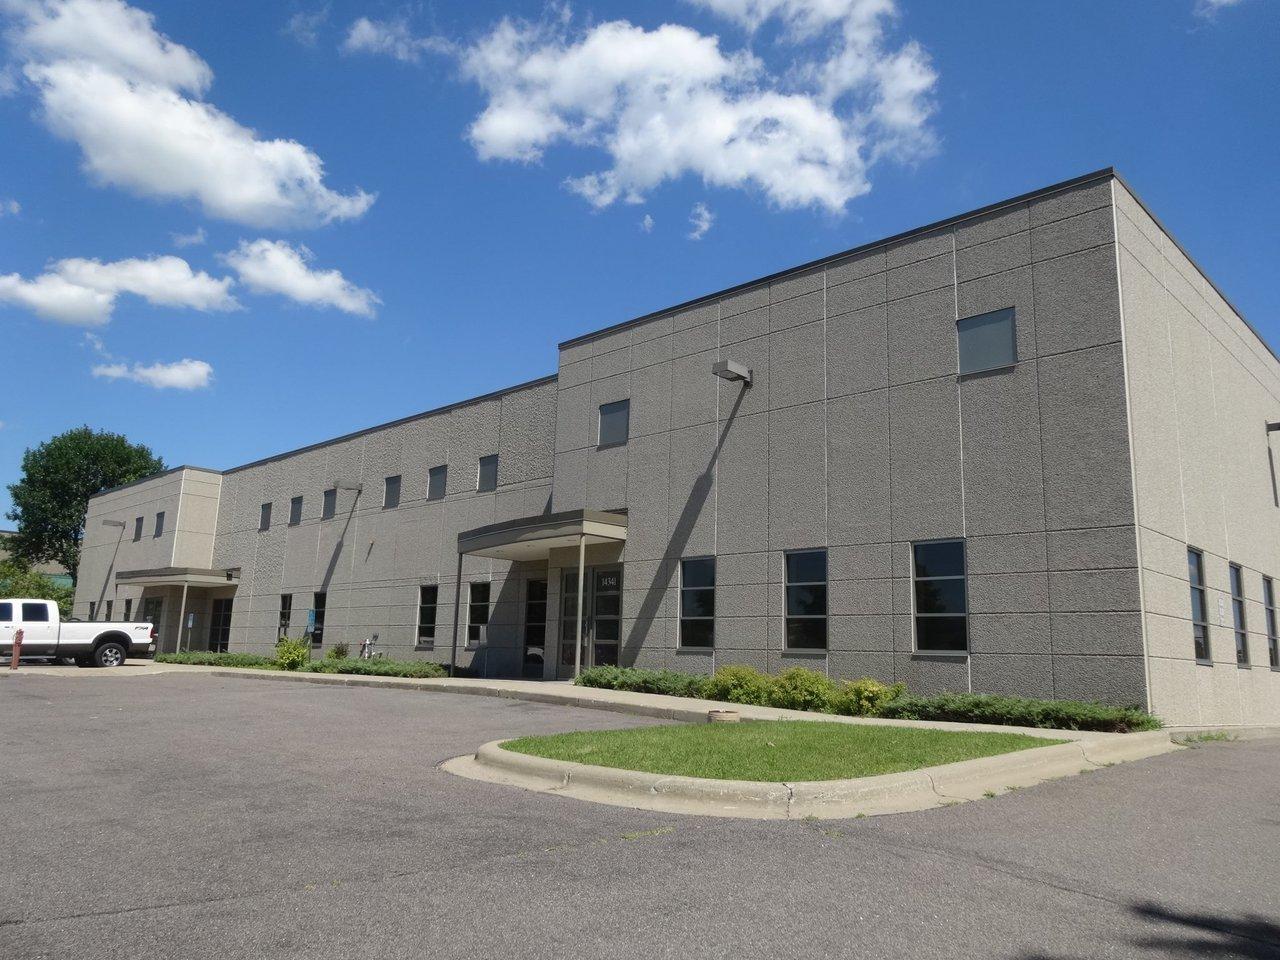 14331-14341 Ewing Ave S, Burnsville, MN, 55337